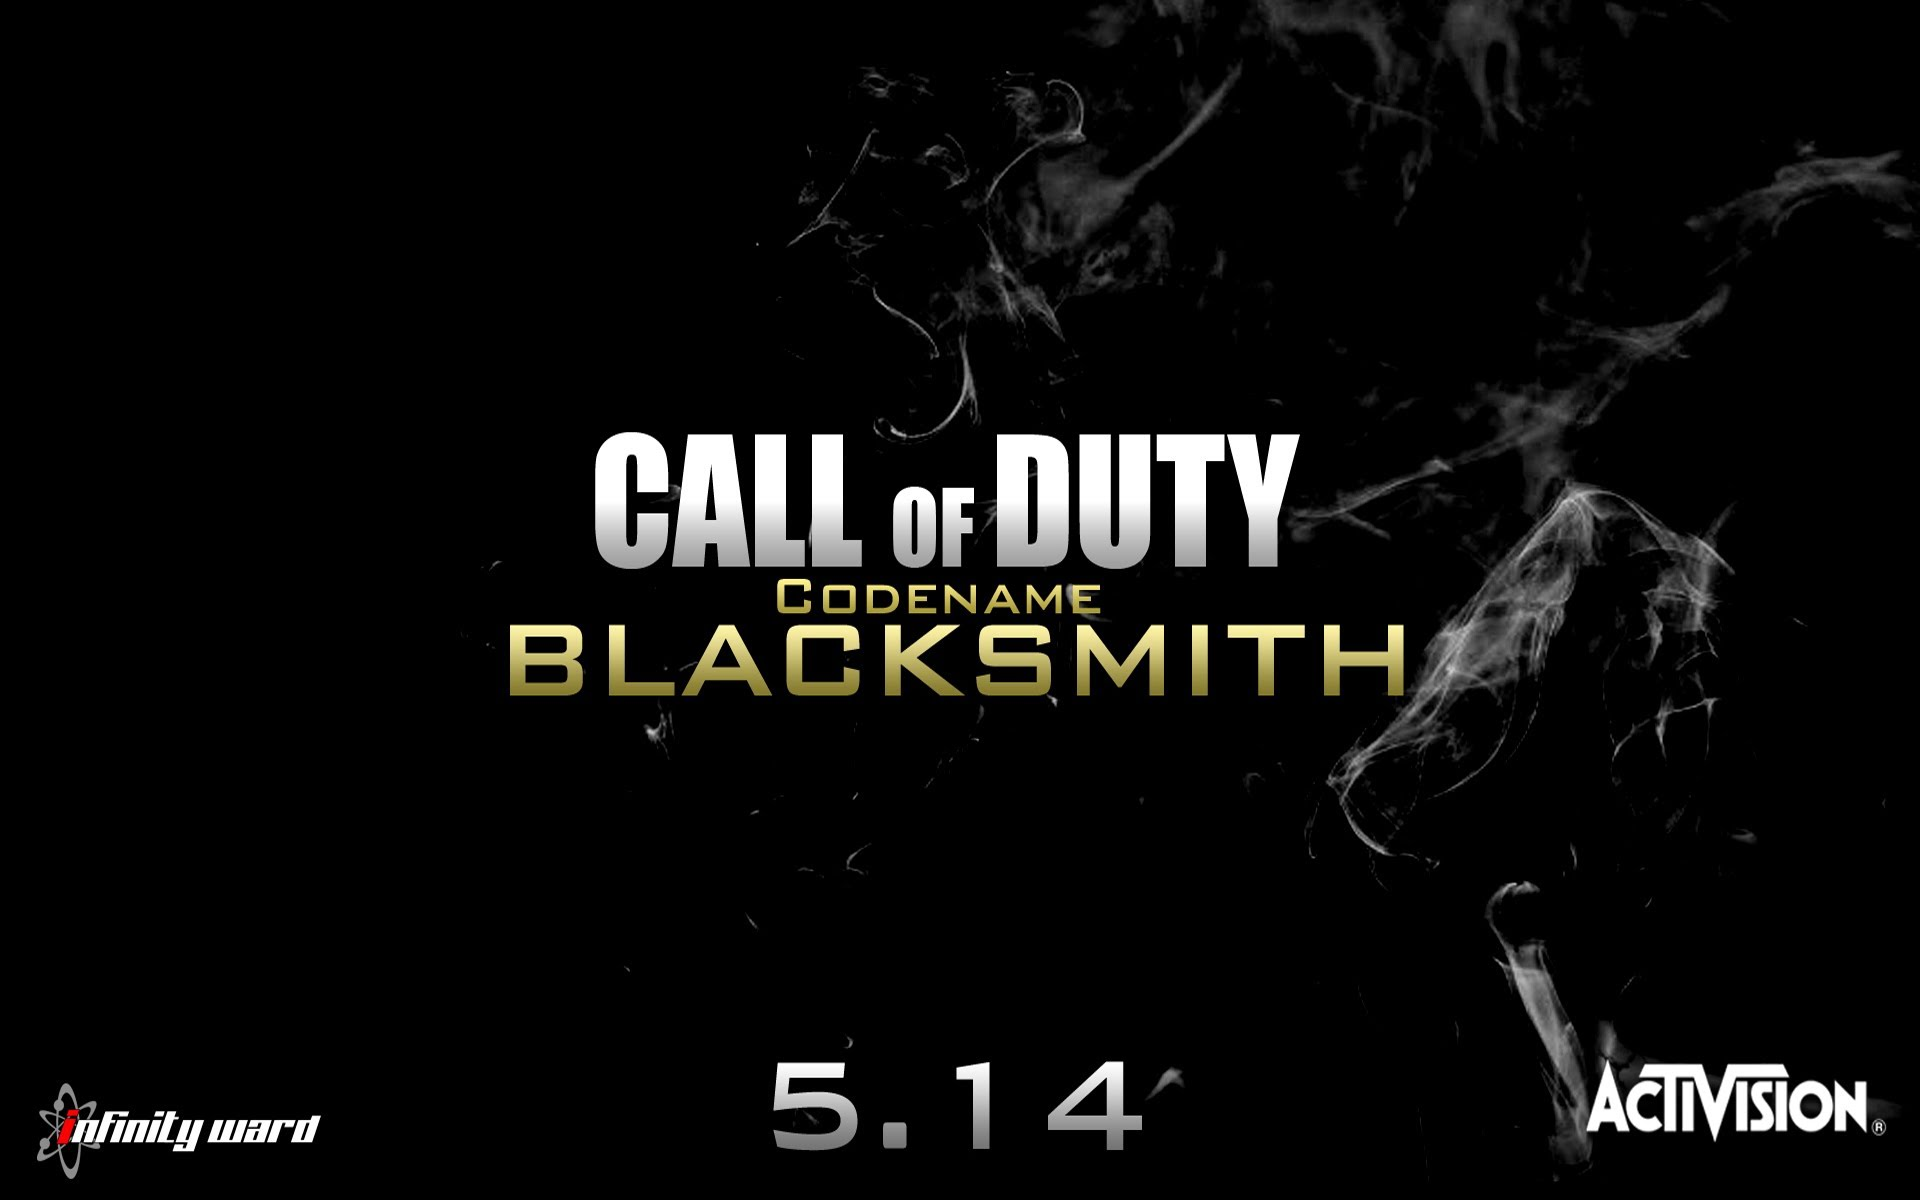 COD Blacksmith